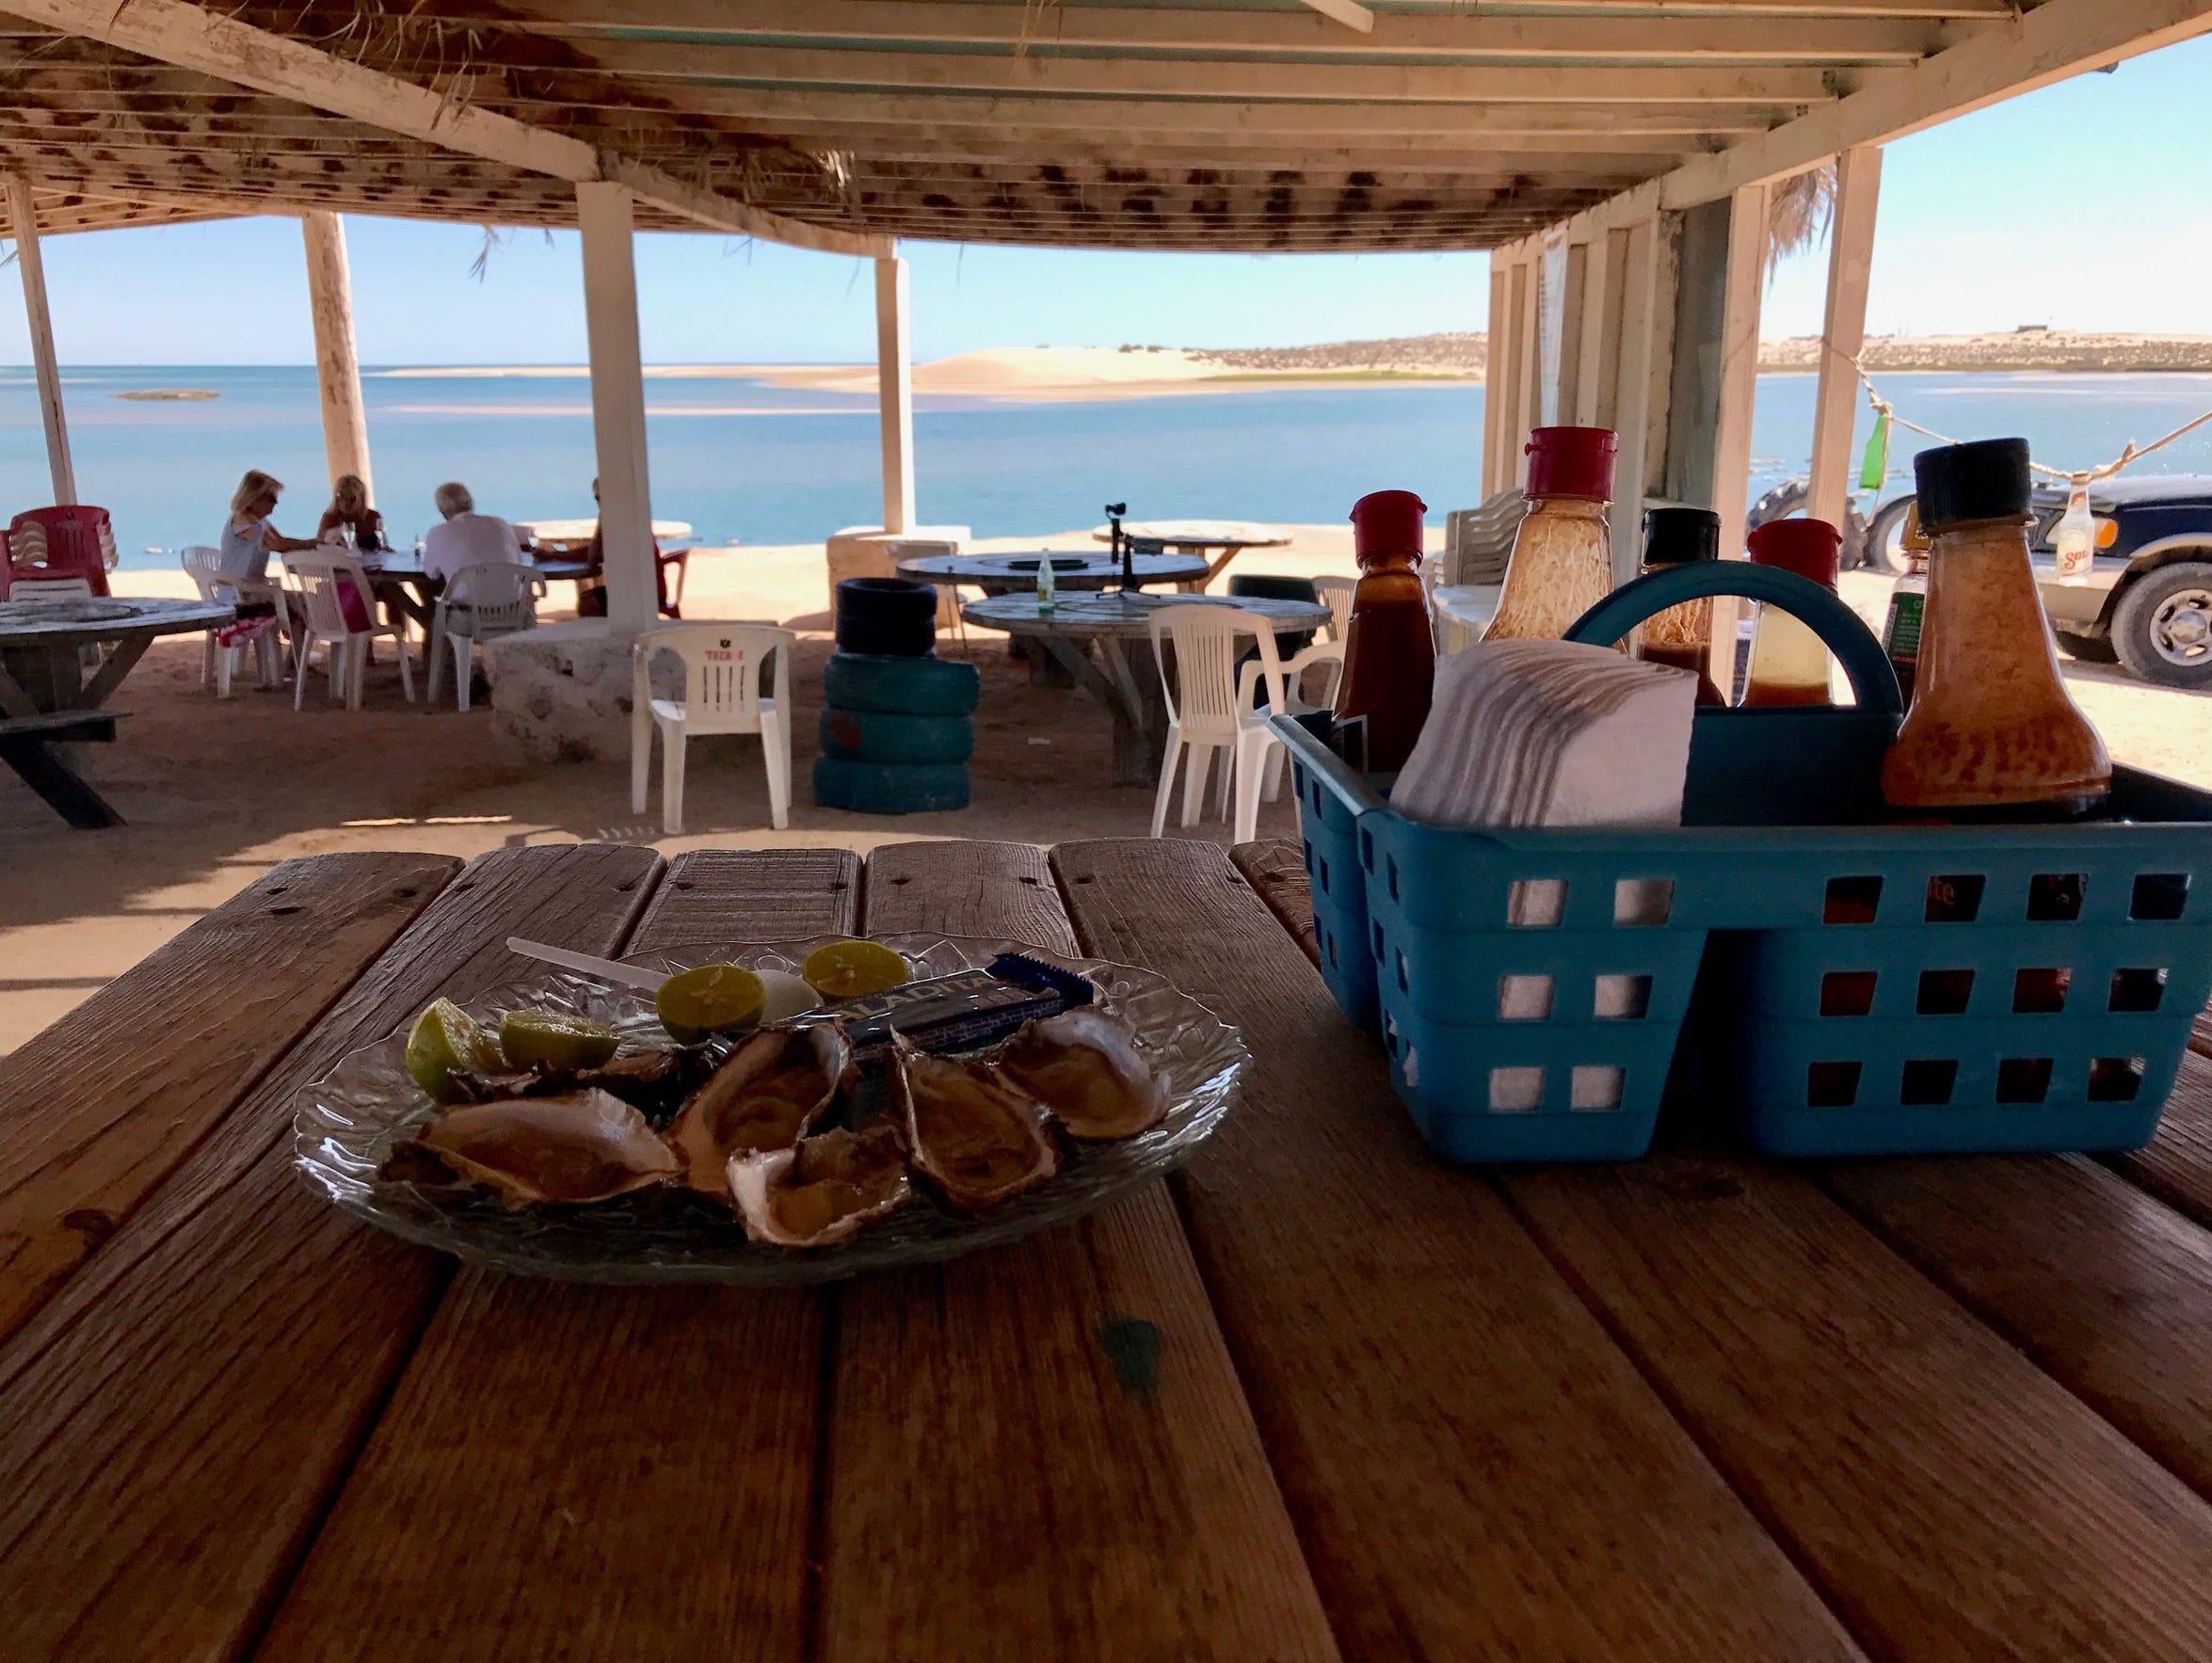 At El Barco, you can sit down, order several dozen